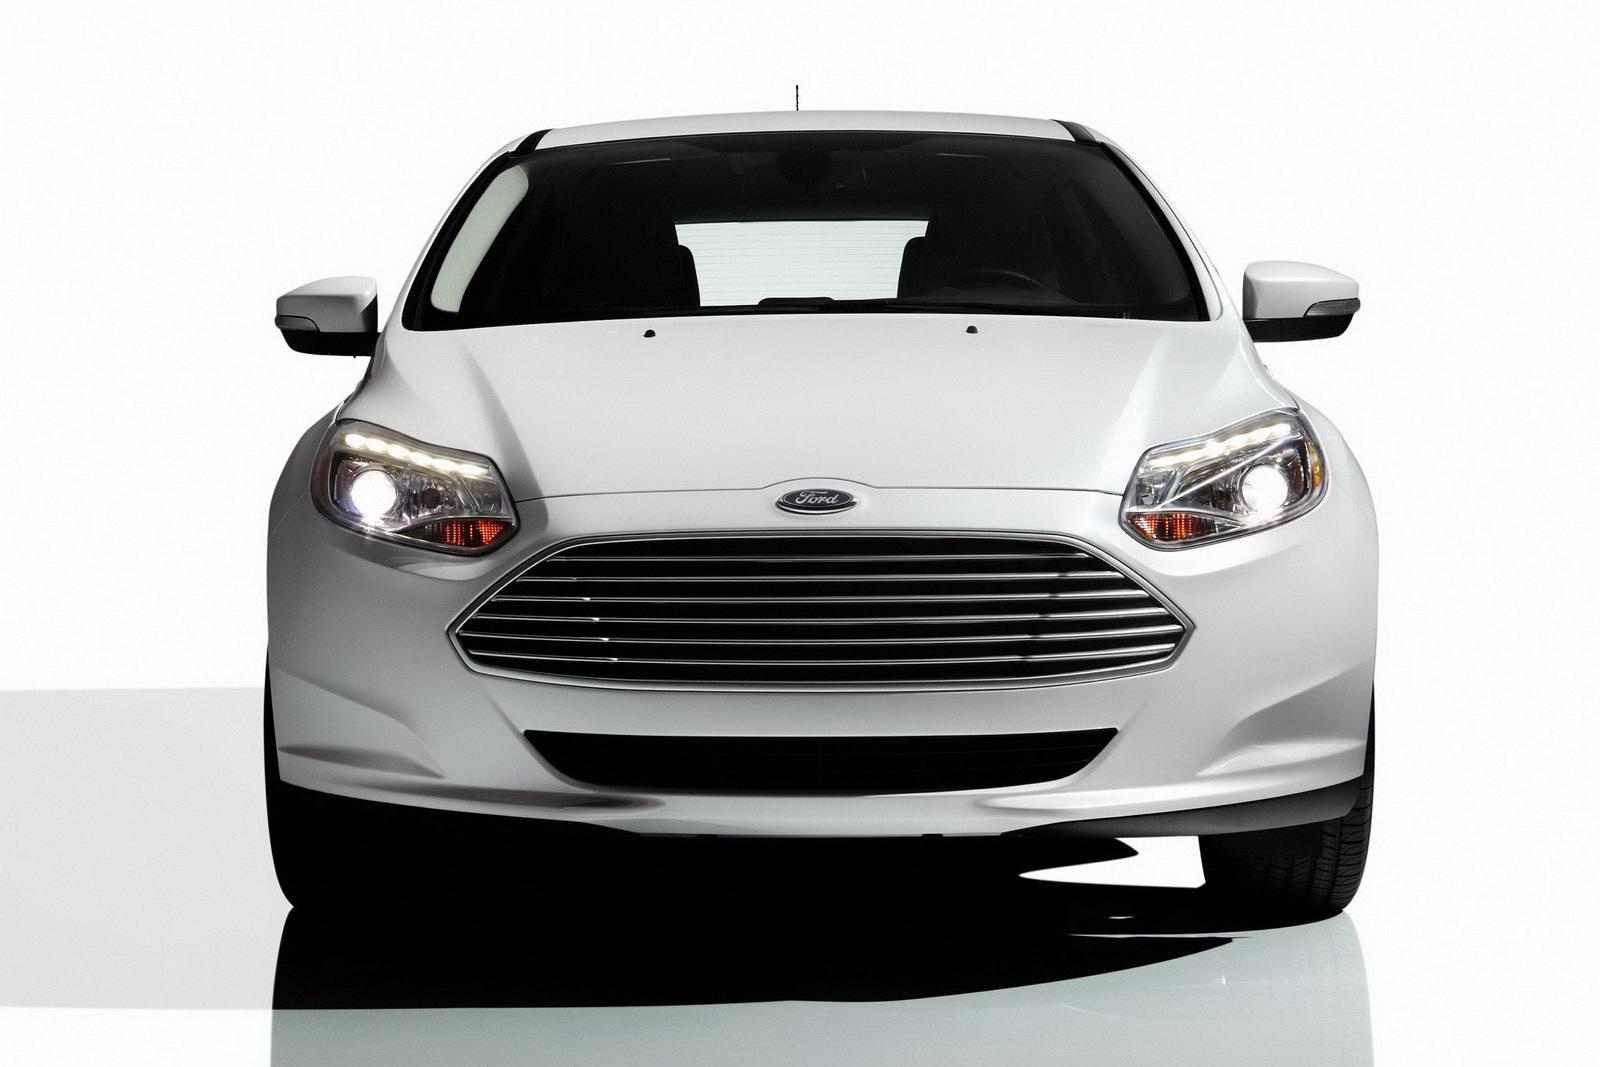 Ford Introduces Focus Electric Car At Ces Las Vegas